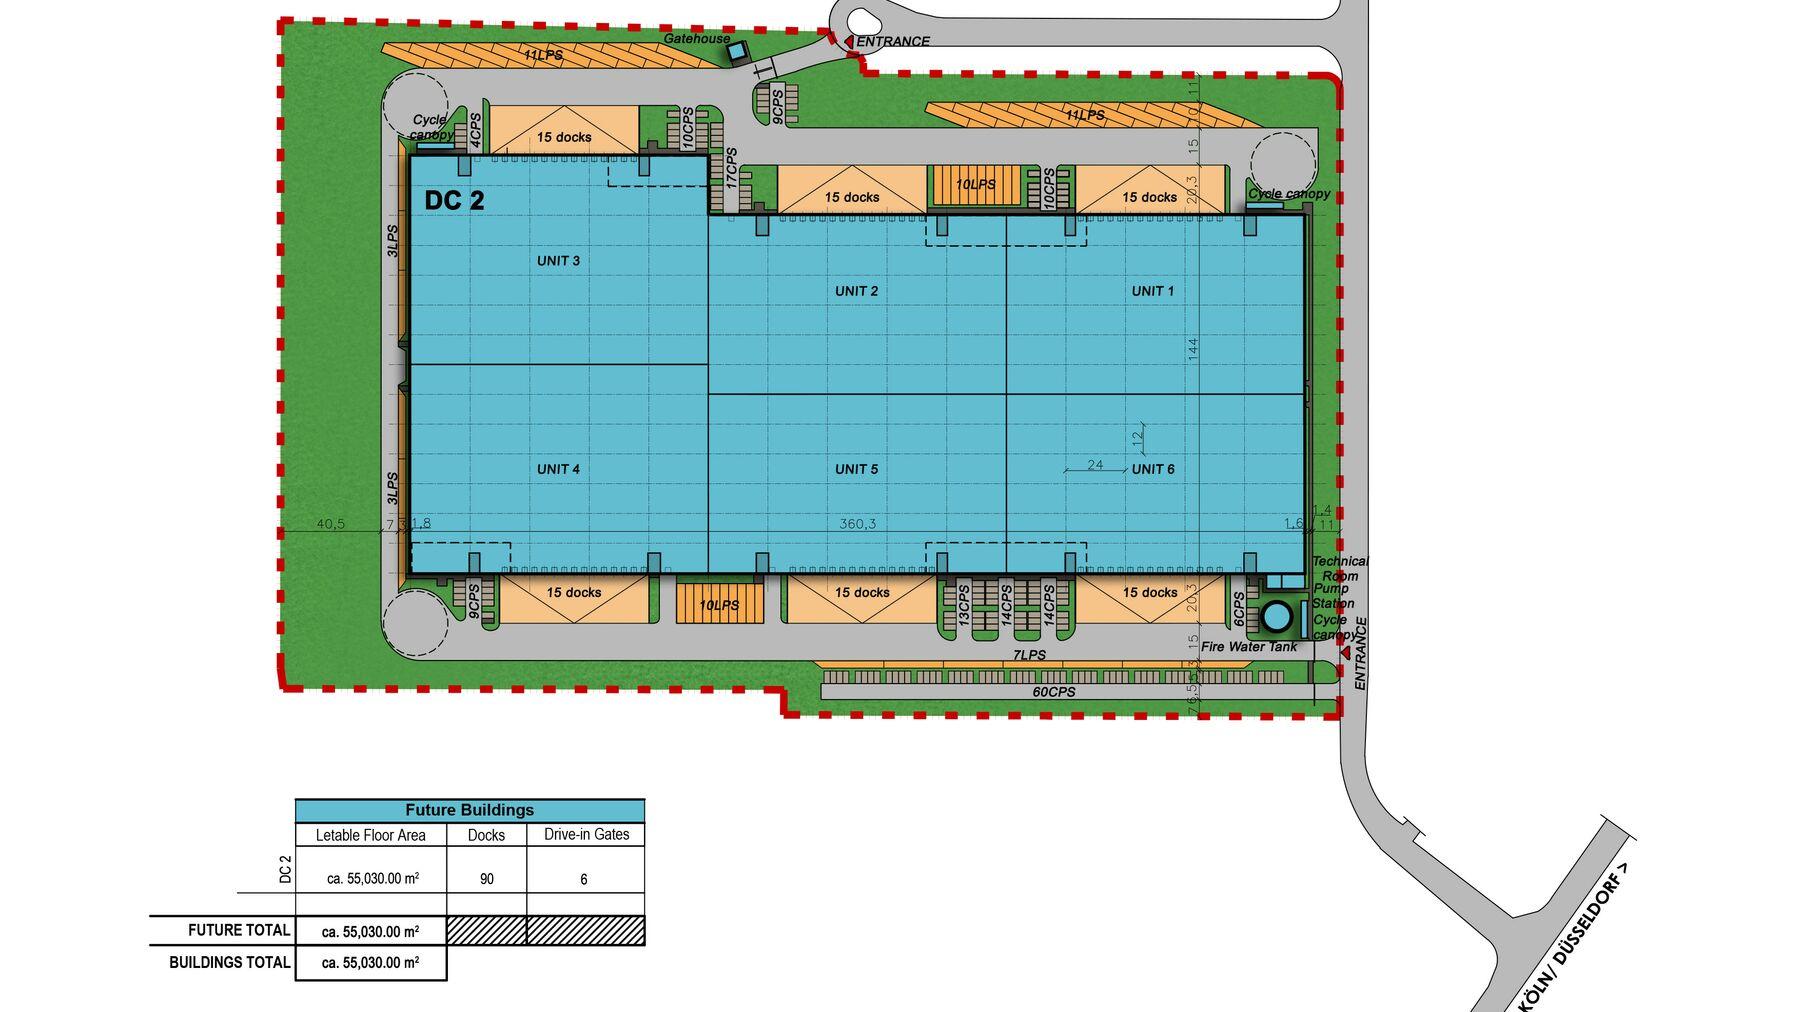 DPM-Cologne-Niehl-DC2_Siteplan.jpg